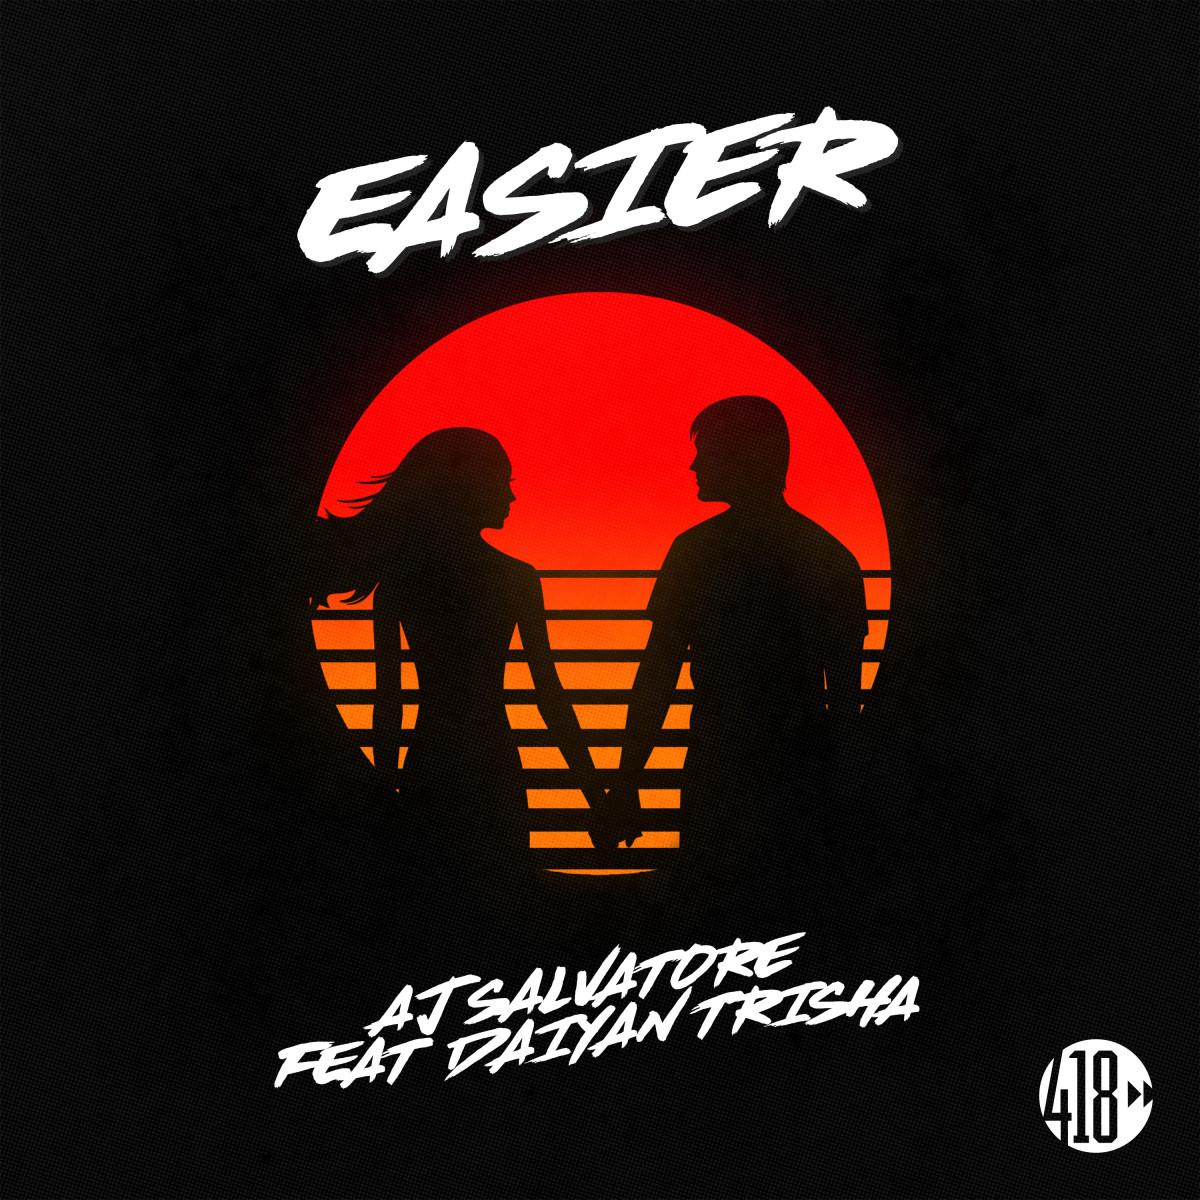 AJ Salvatore and Daiyan Trisha Easier Album Art